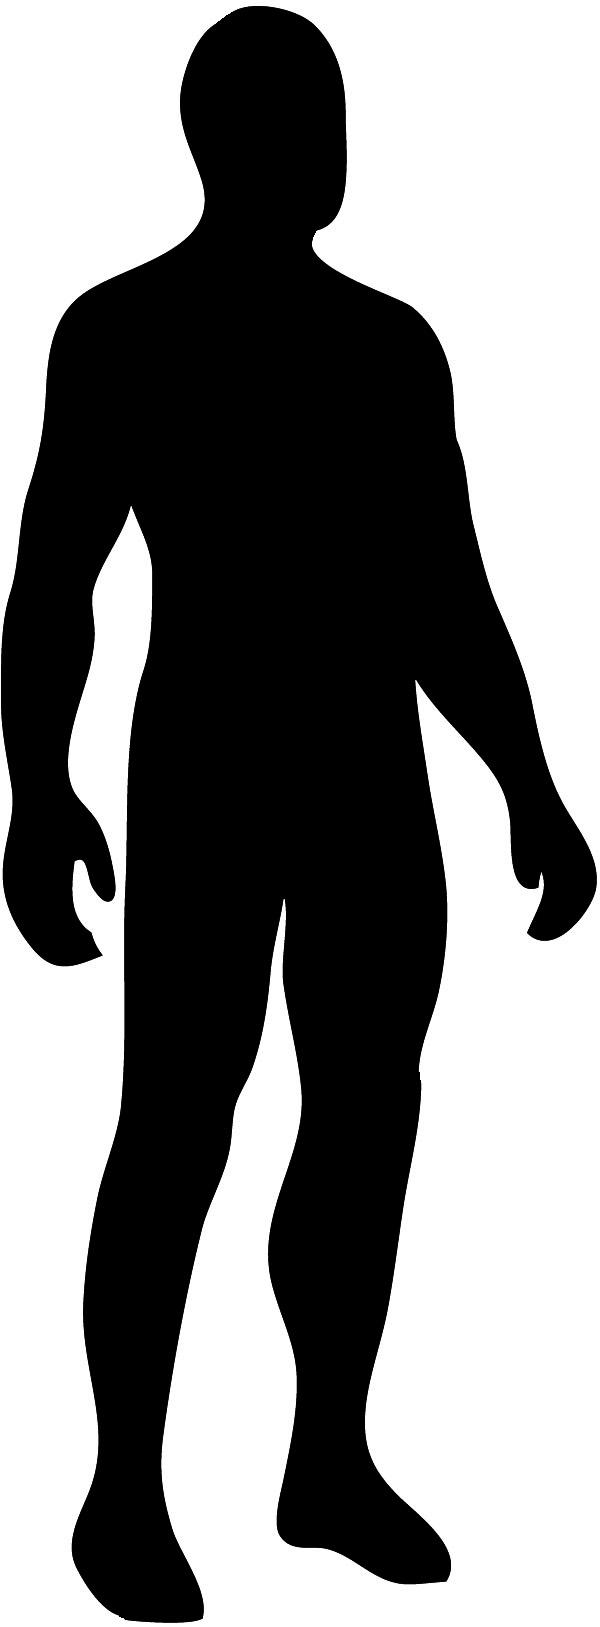 Body Silhouettes